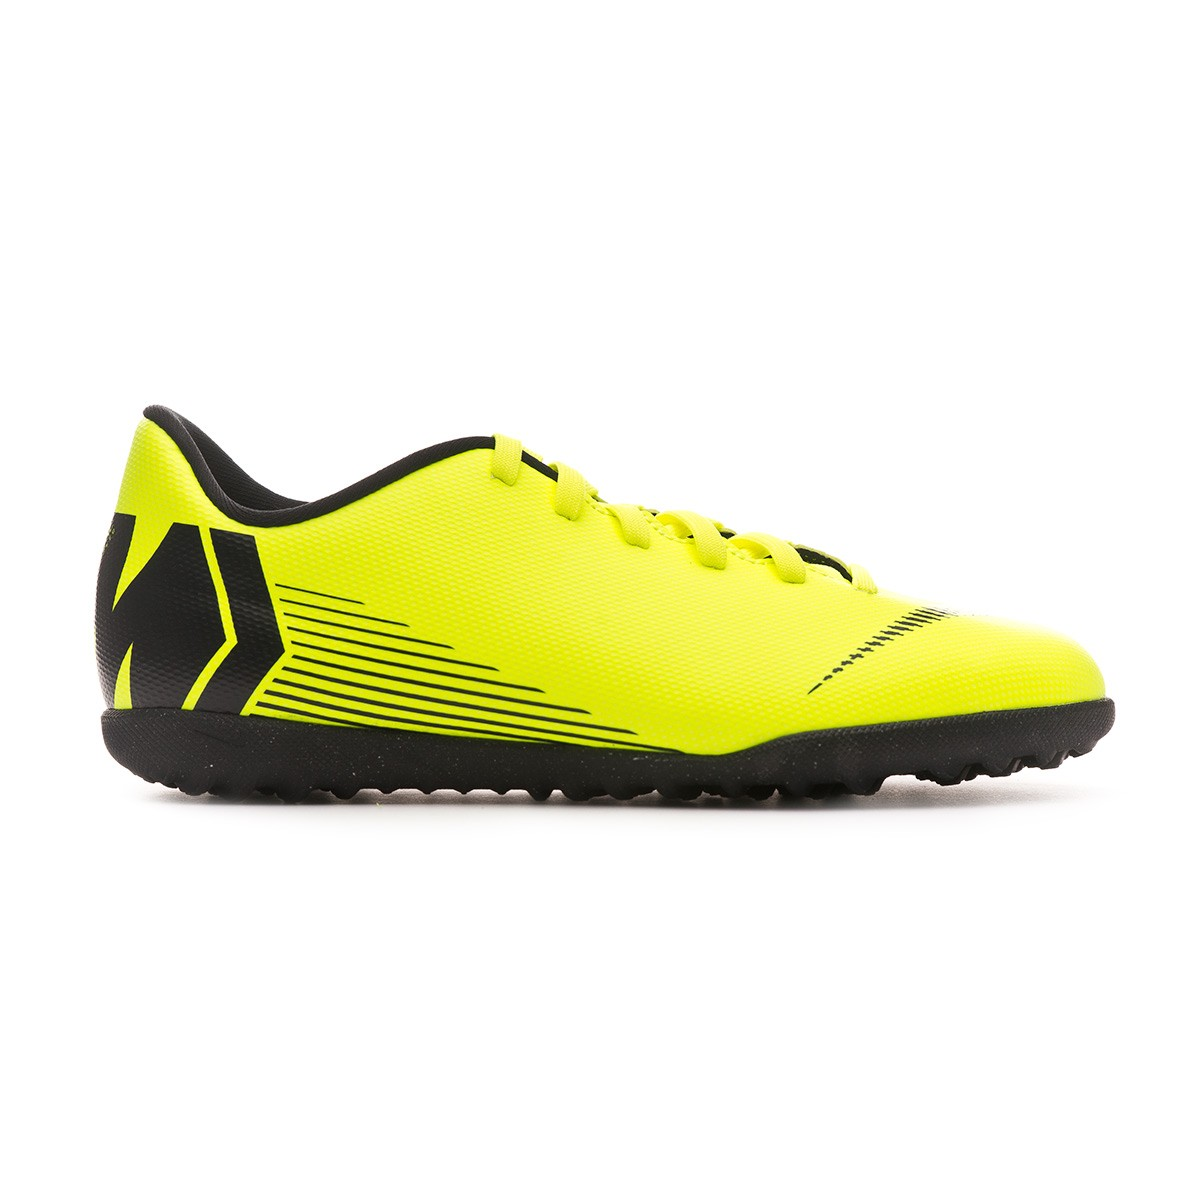 41c28af96 Football Boot Nike Kids Mercurial VaporX XII Club Turf Volt-Black - Tienda  de fútbol Fútbol Emotion